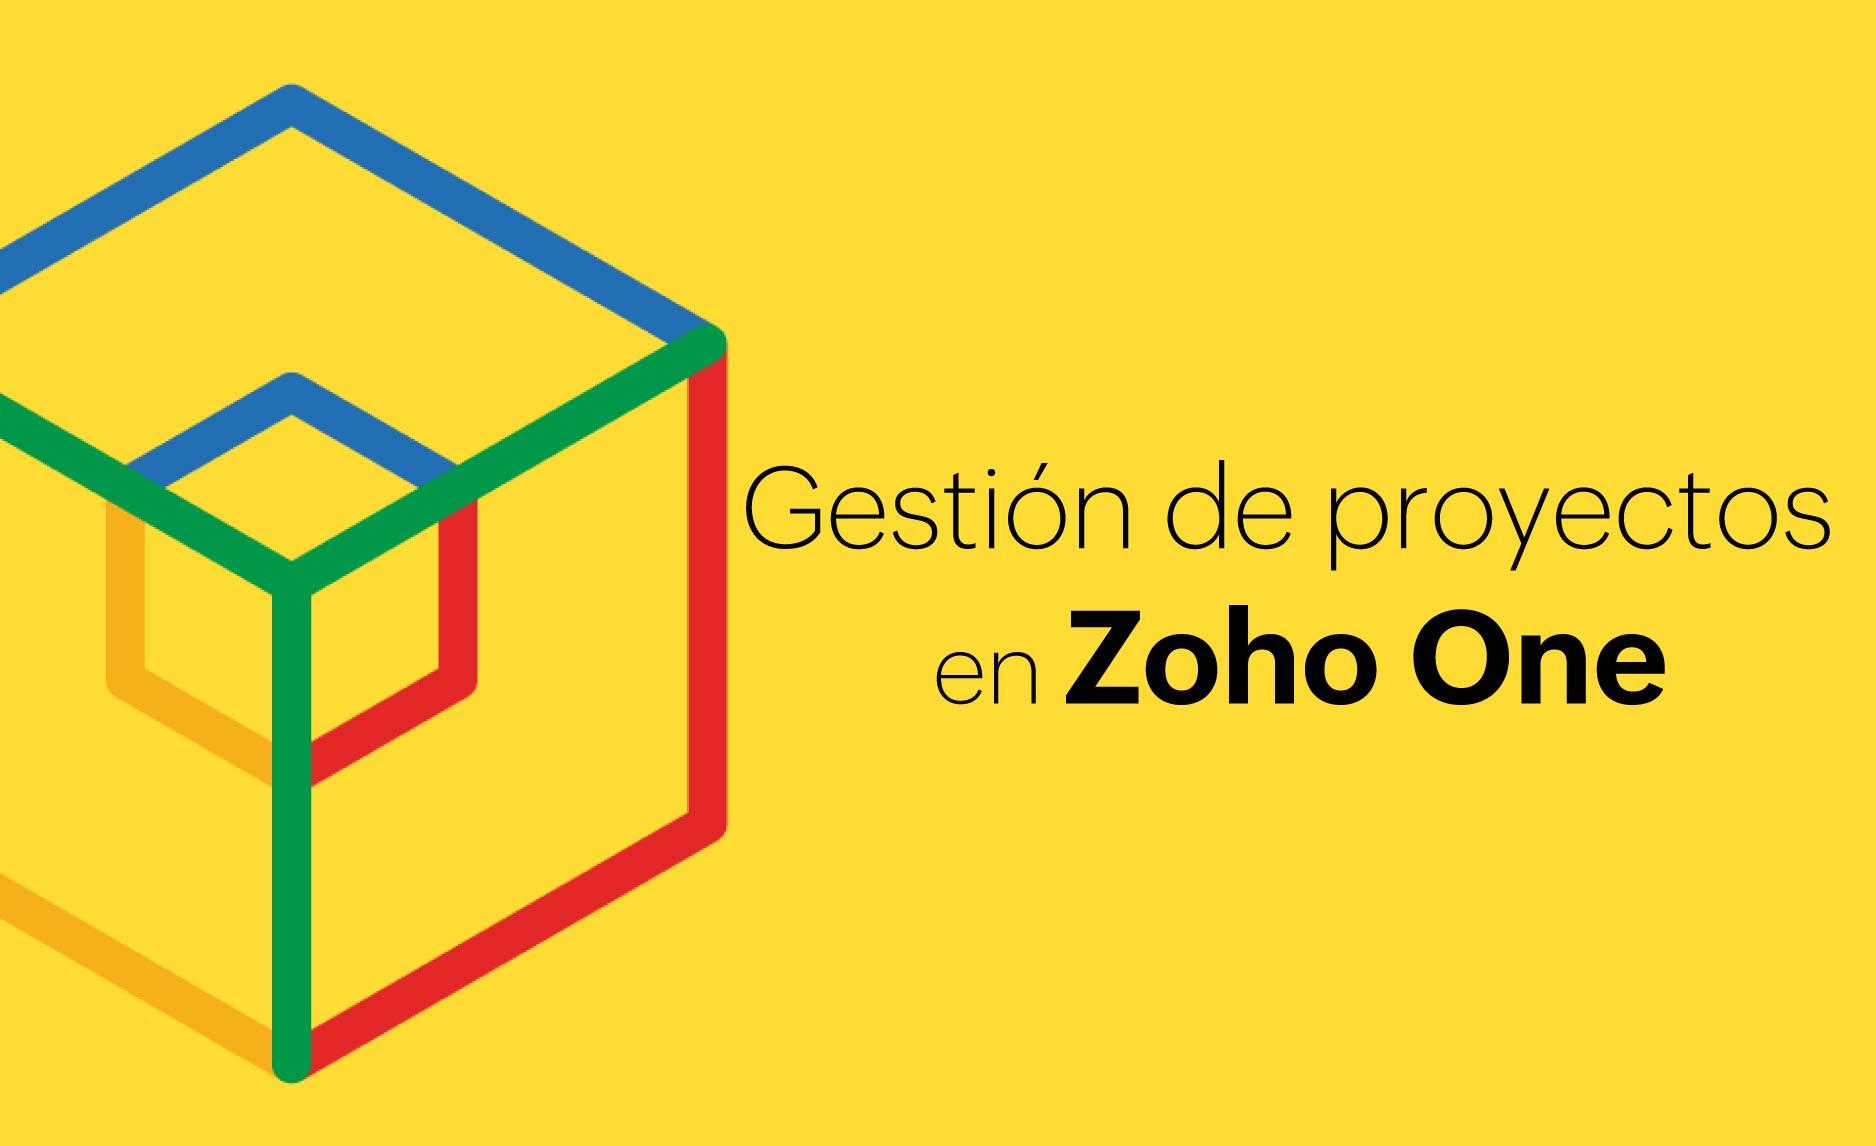 Administración de proyectos completa con Zoho One